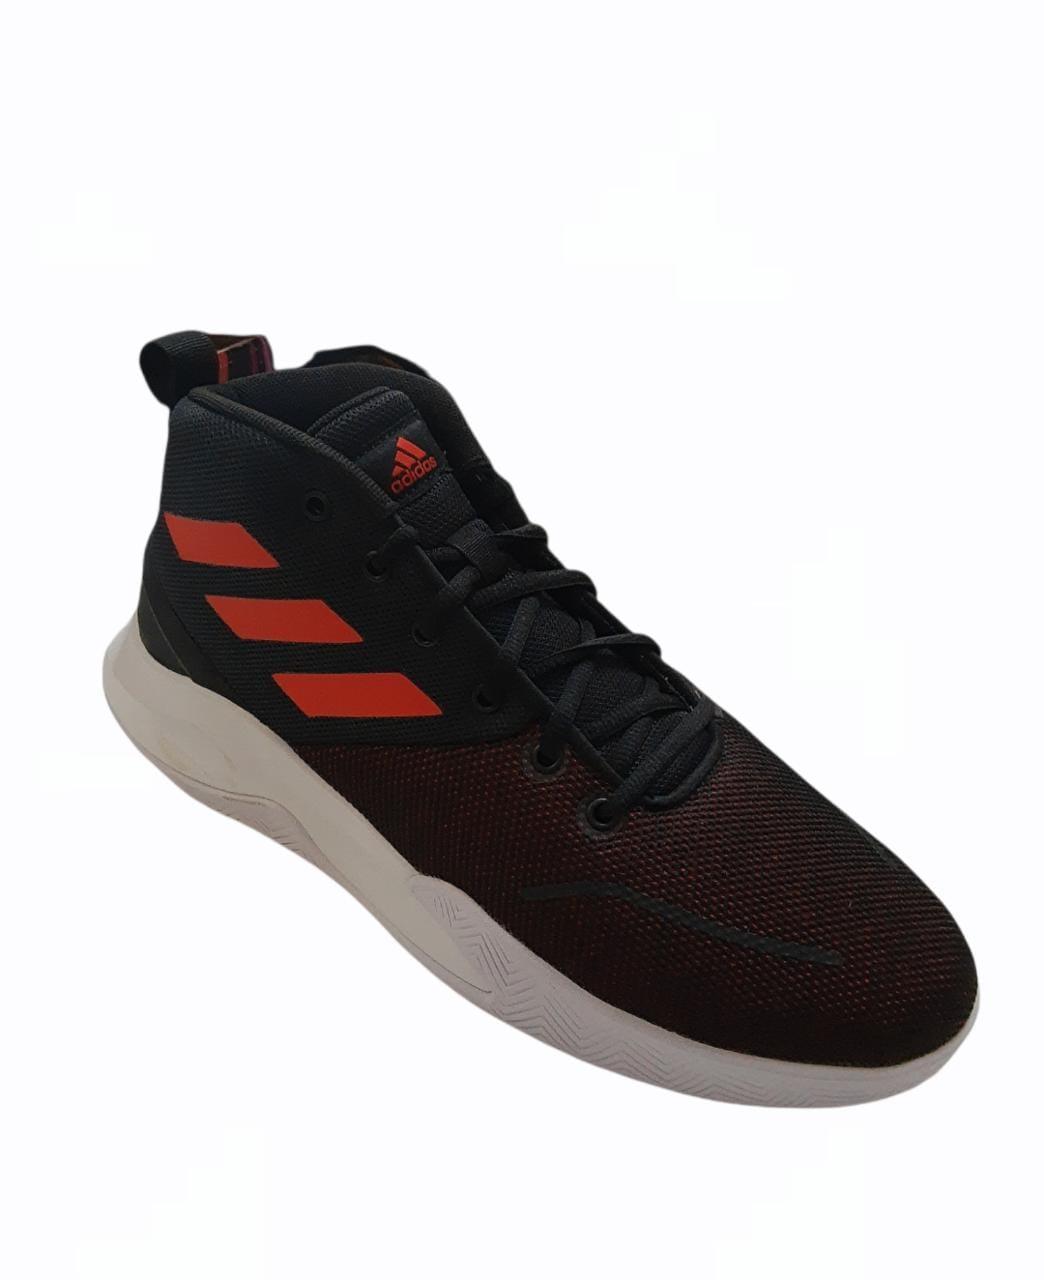 Tênis Adidas Own The Game - Masculino